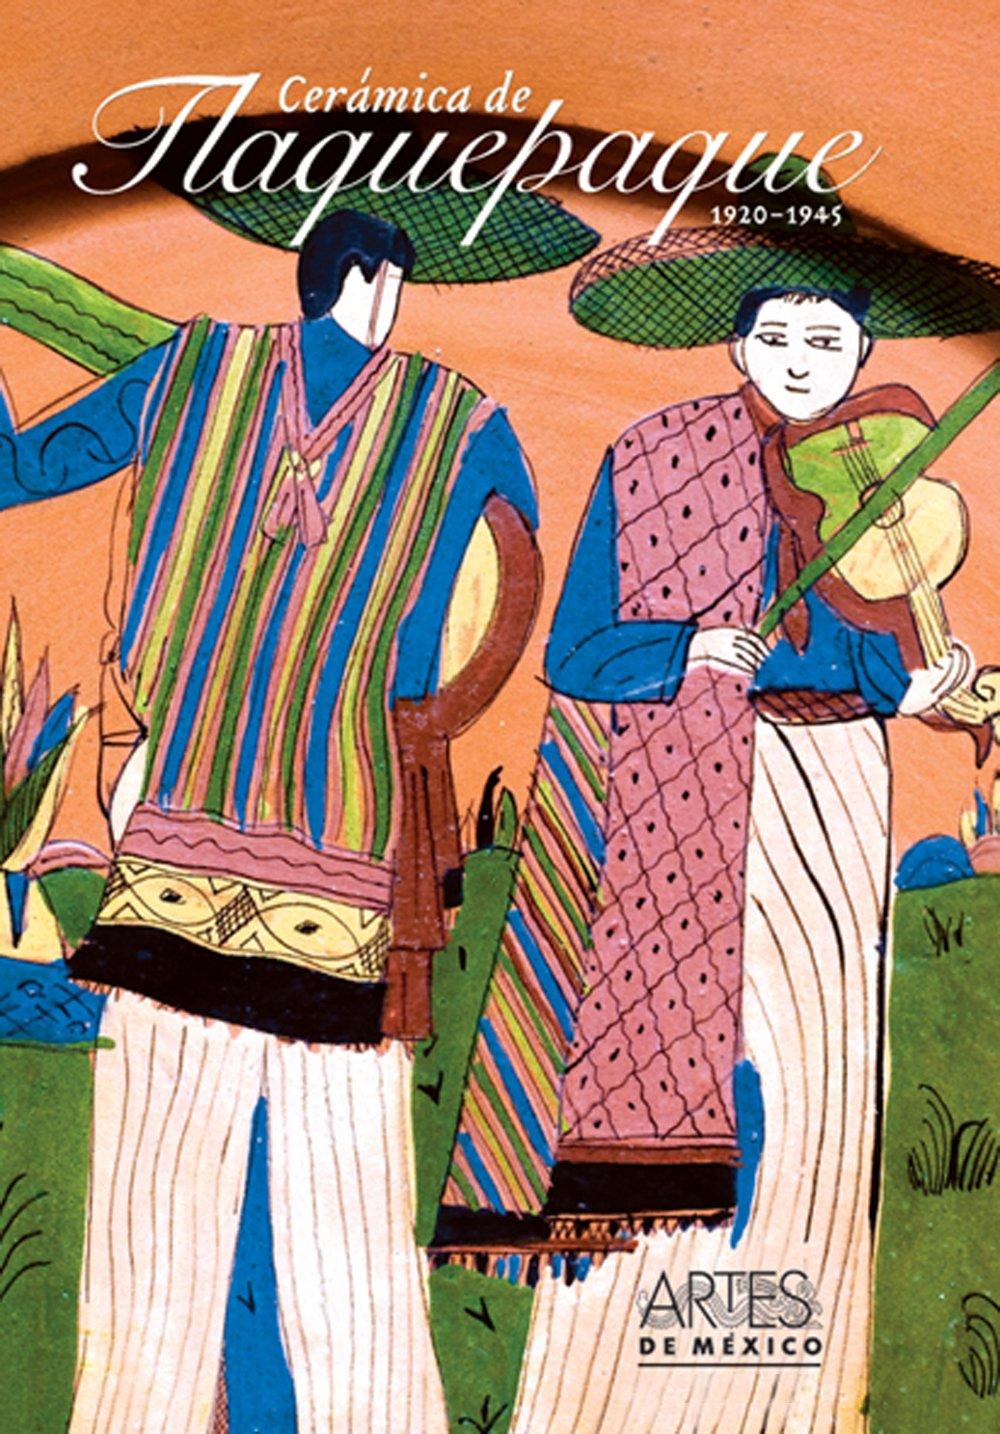 Artes de Mexico # 87. Ceramica de Tlaquepaque / Ceramics from Tlaquepaque (Spanish and English Edition)